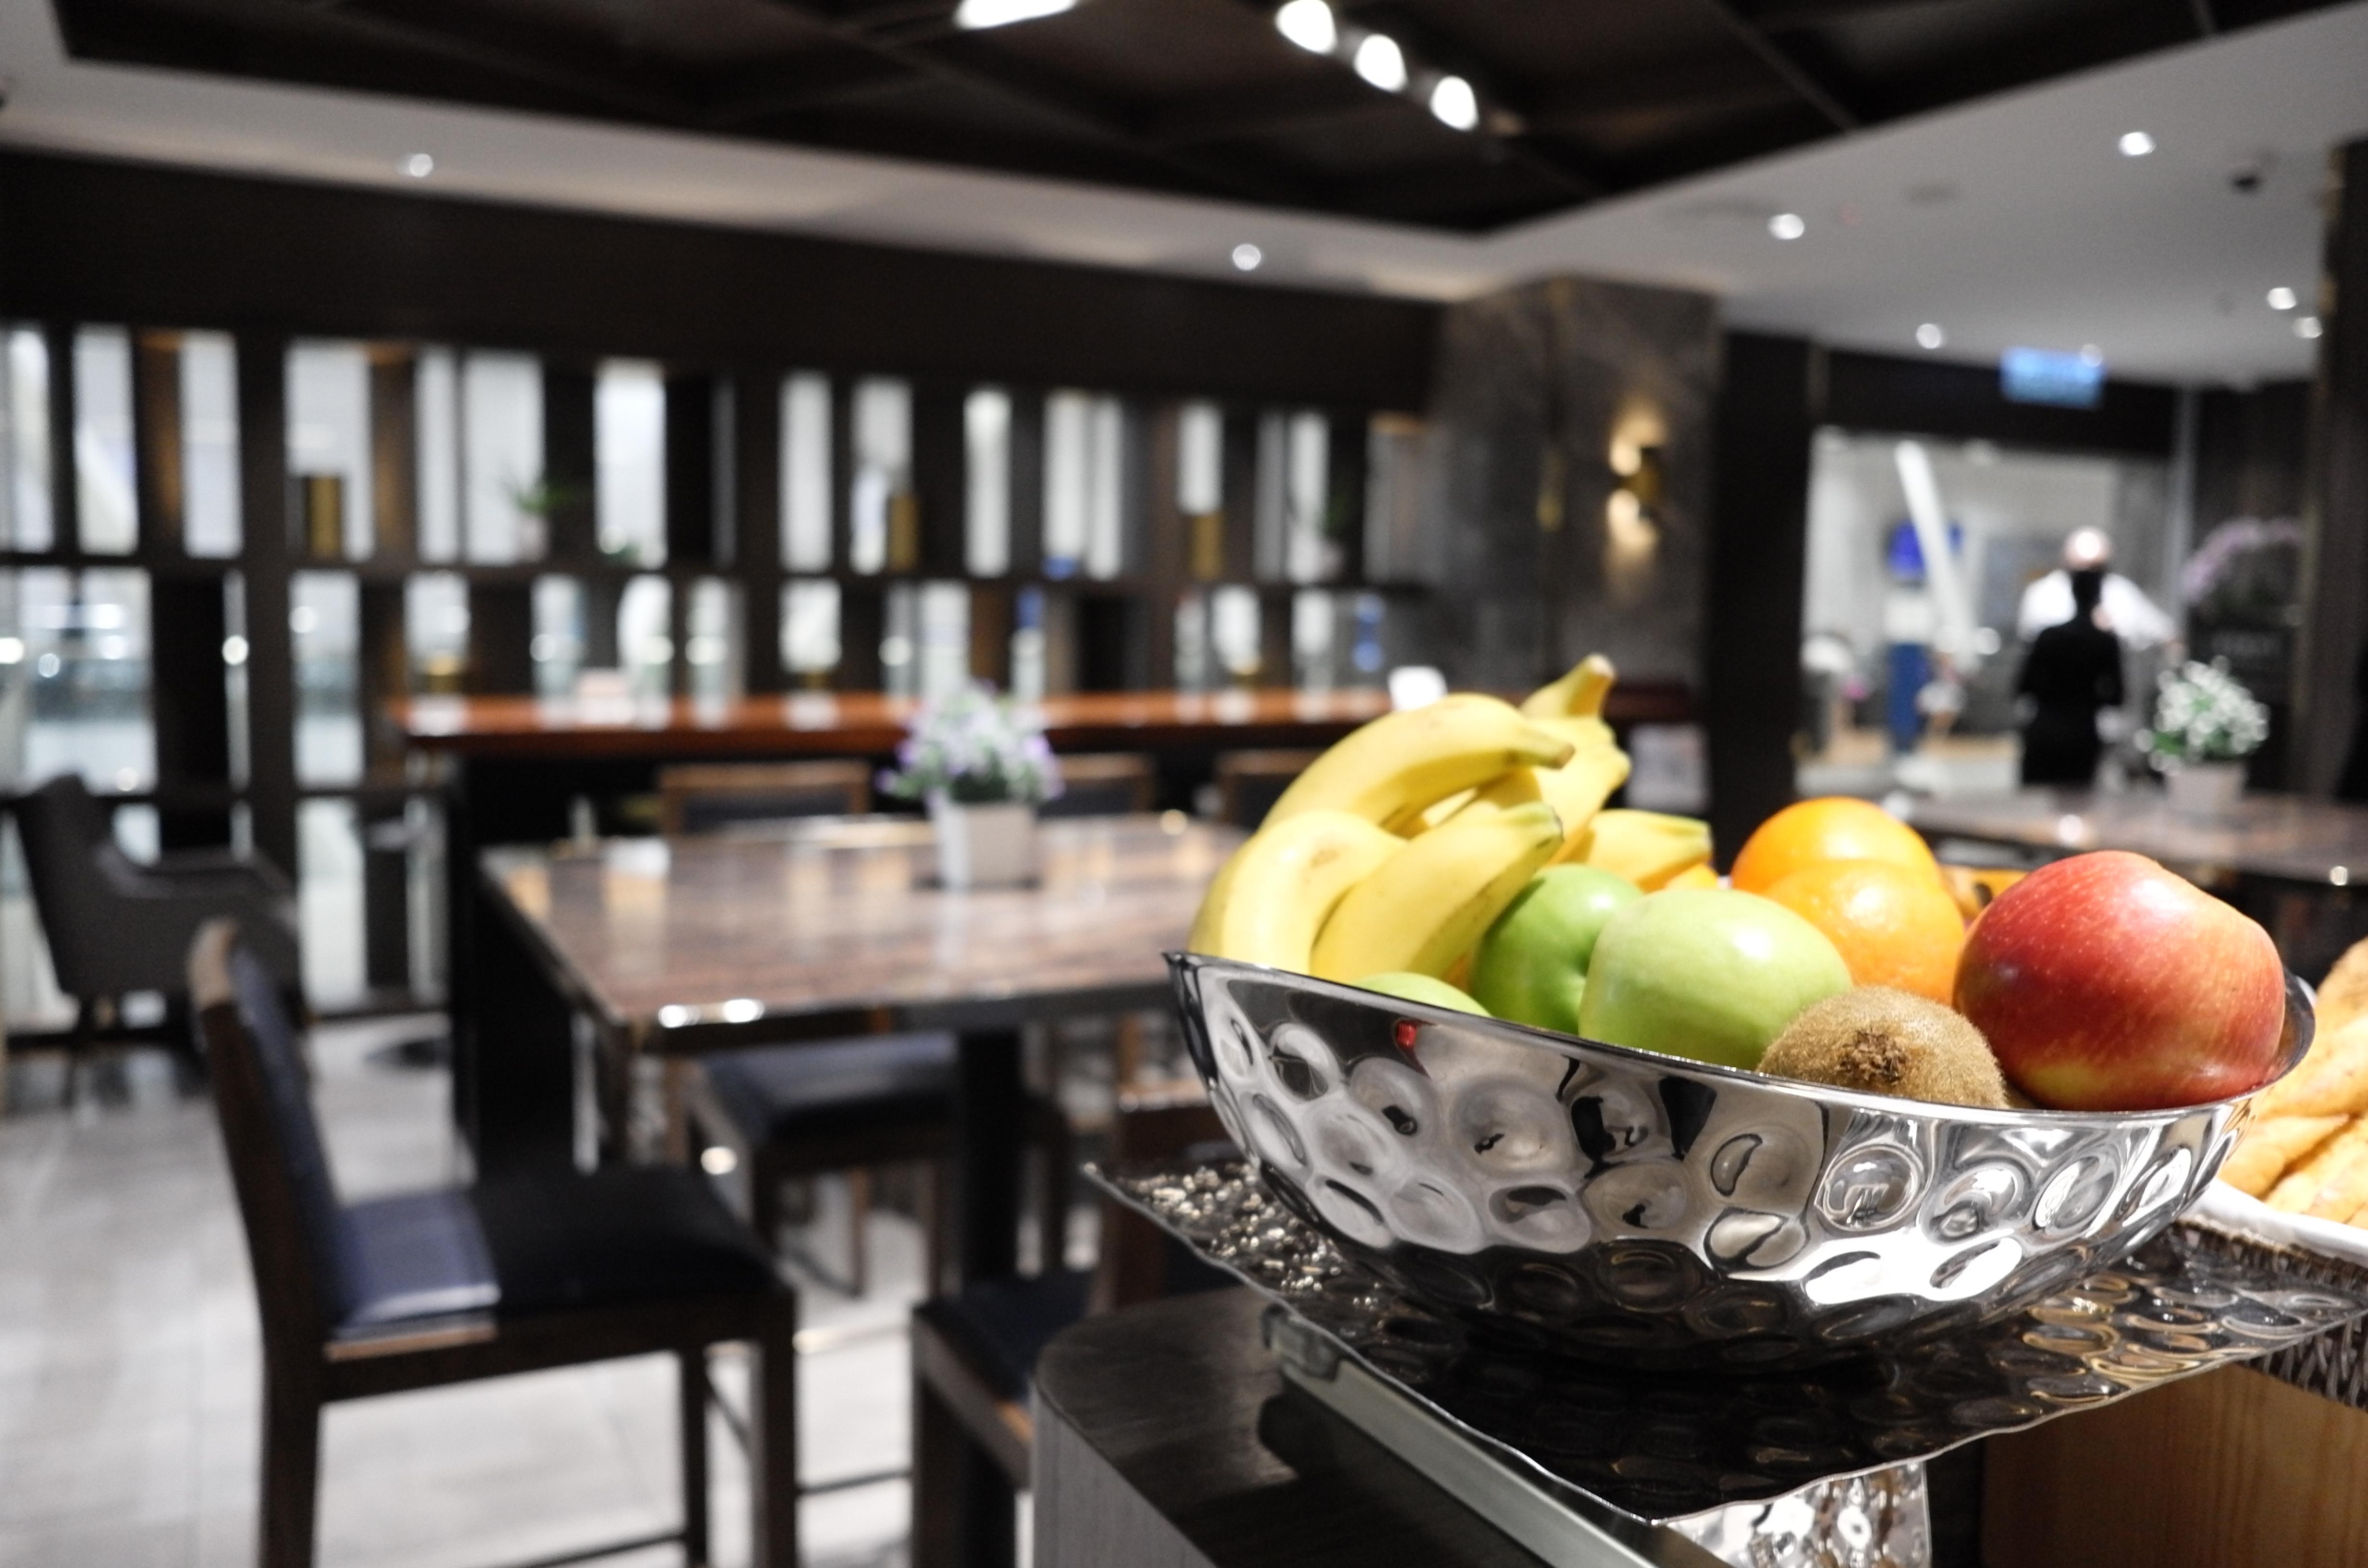 Lounge Review : クアラルンプール空港(KUL) プラザプレミアムファーストラウンジ(Plaza Premium First Lounge)